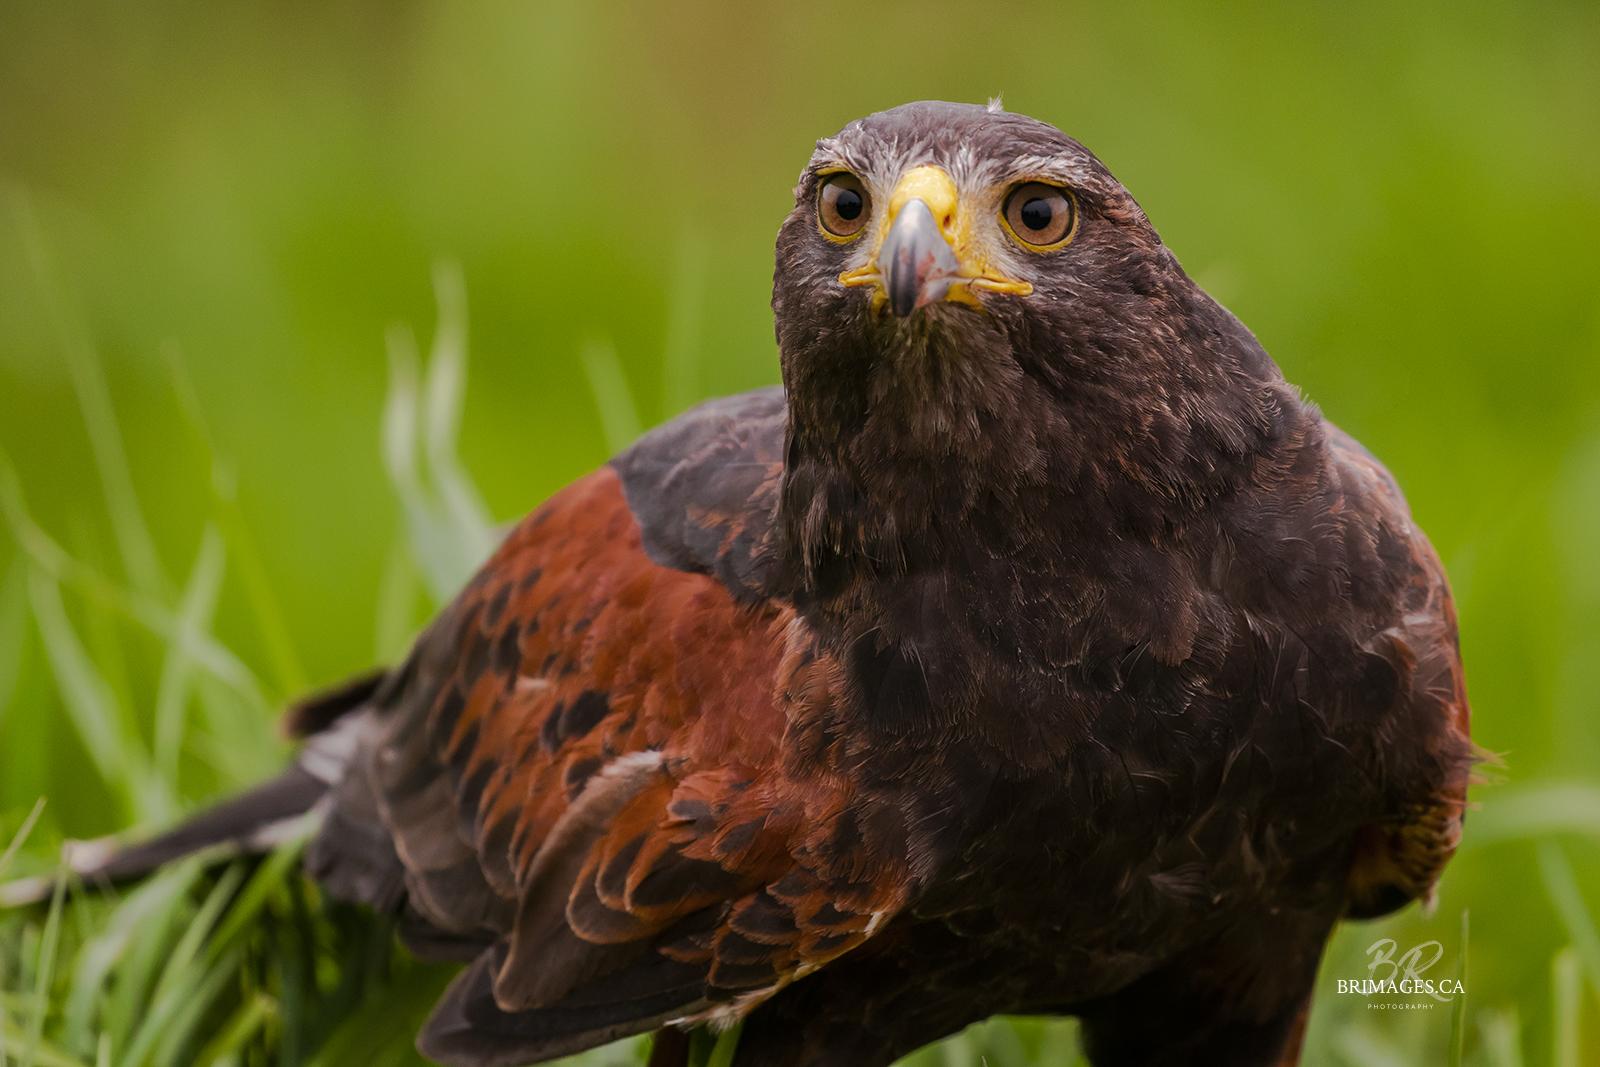 harris-hawk-falconry-PEI-Canada-BRimages.ca